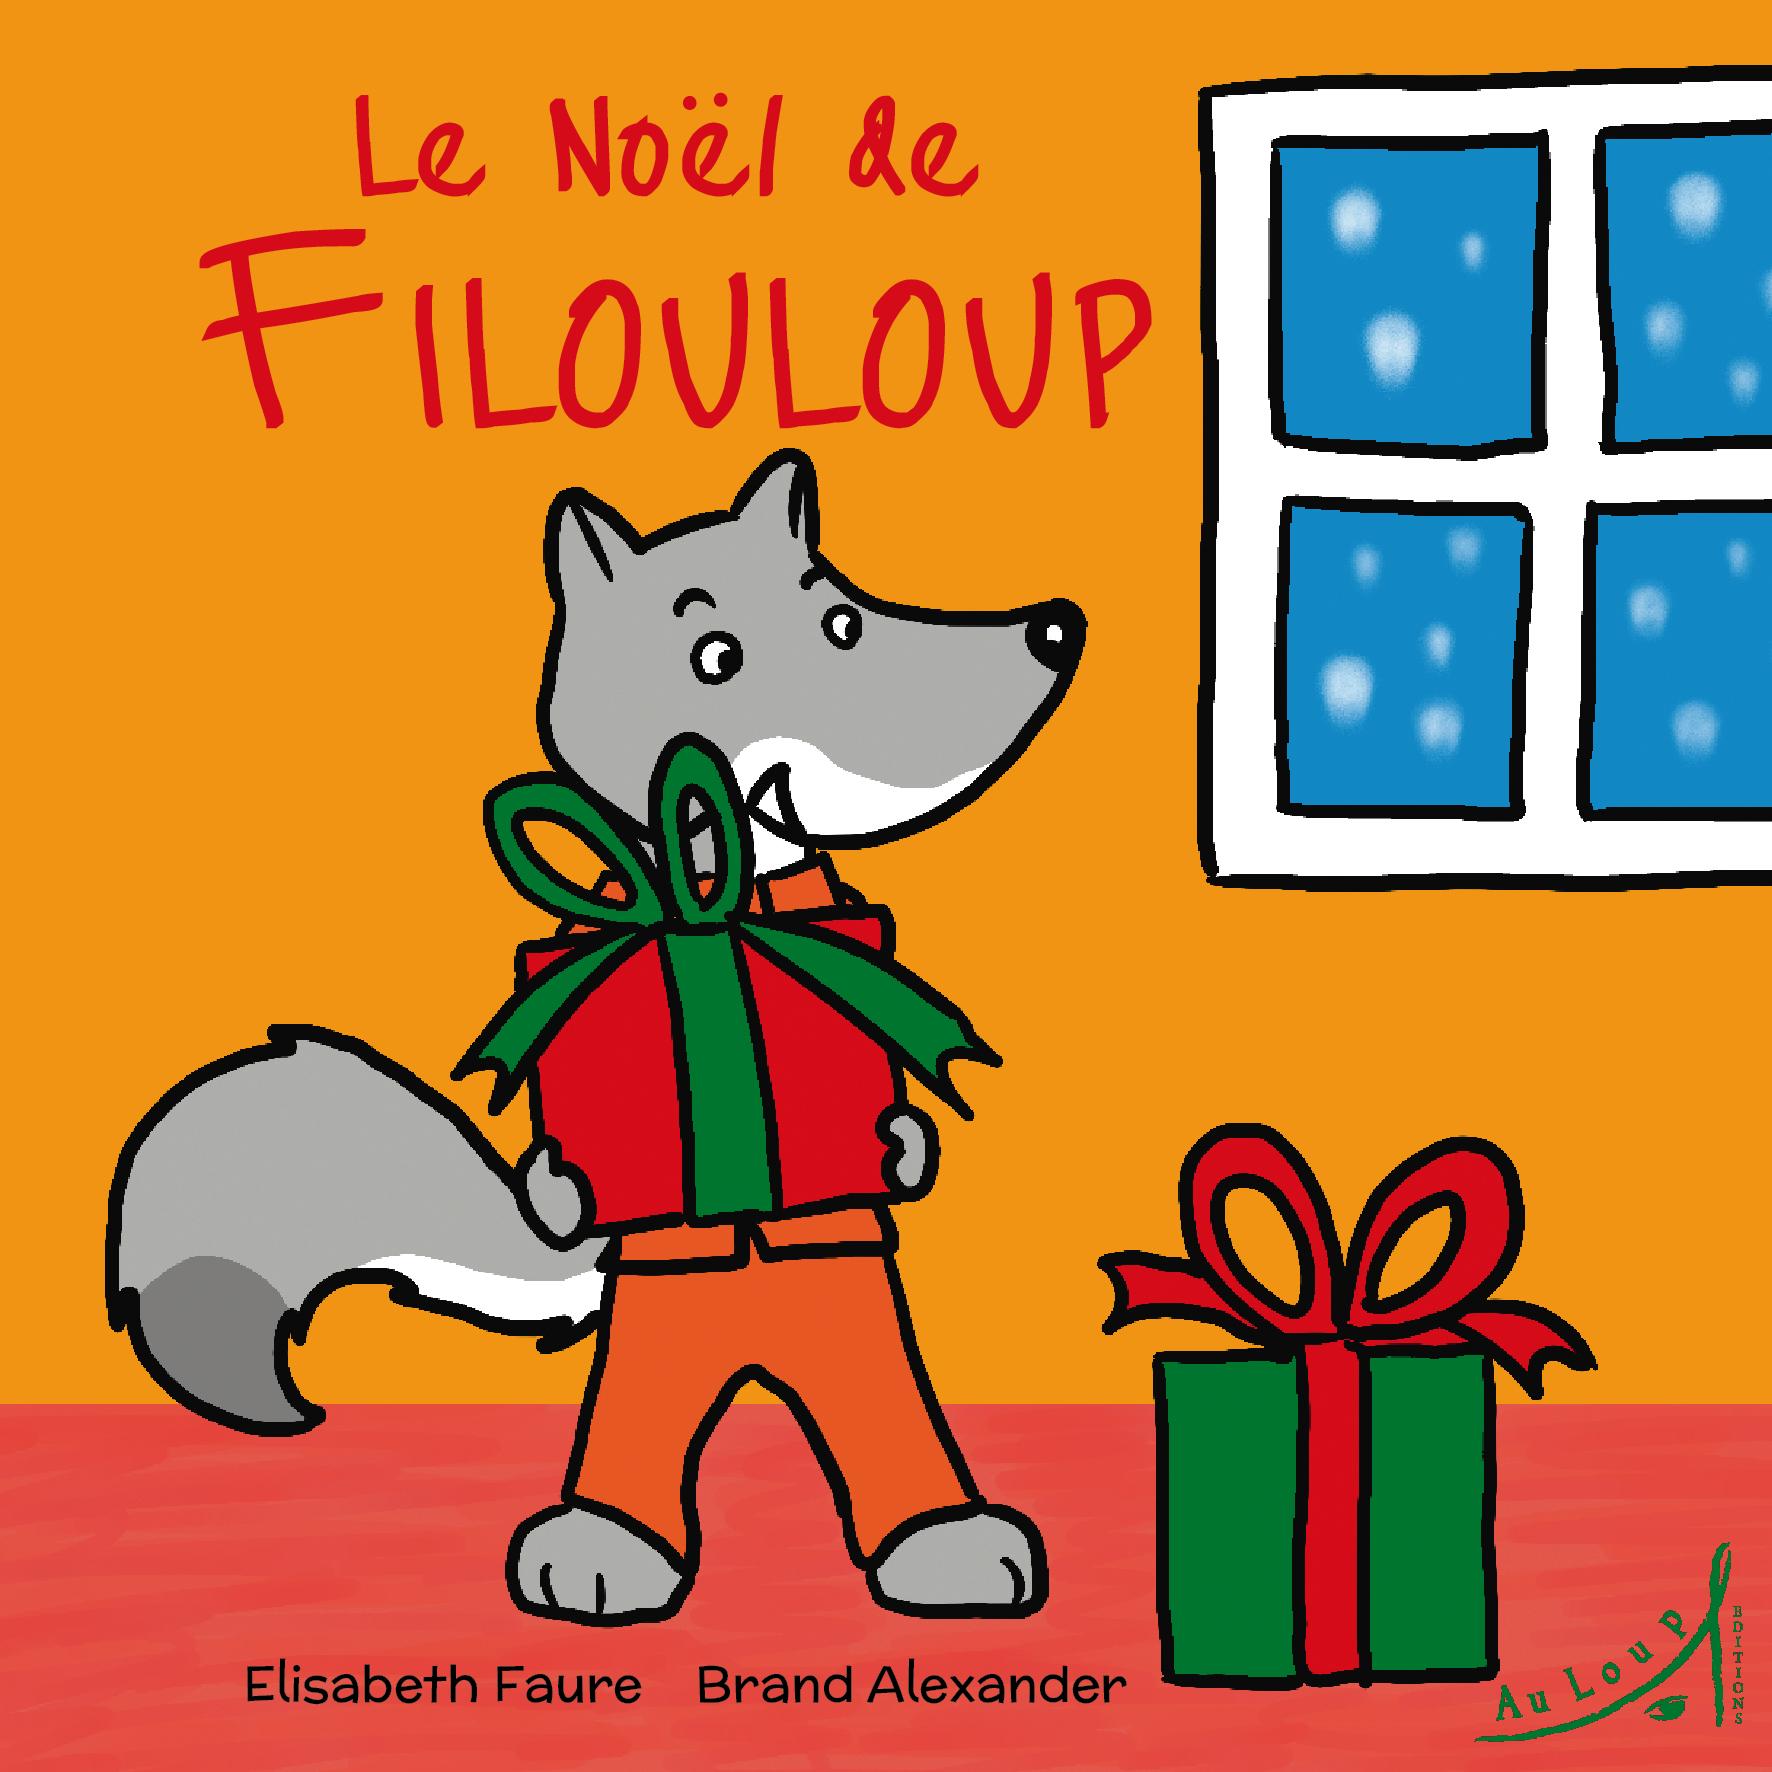 auloup_filouloup2_couv_avant_fr